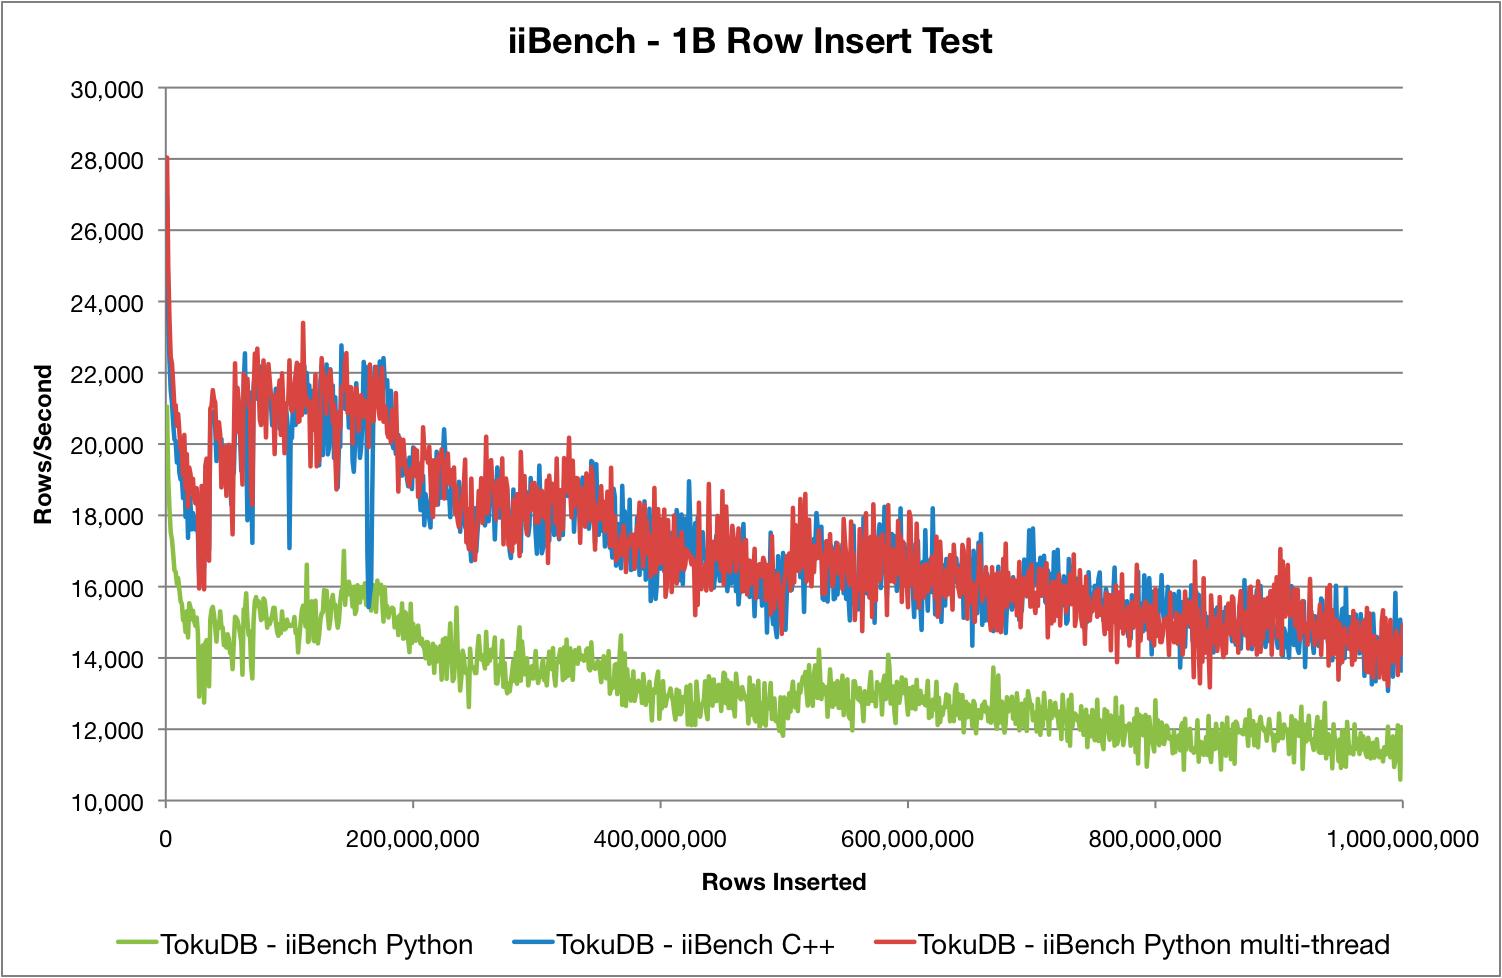 MySQL insert performance with iiBench Python client